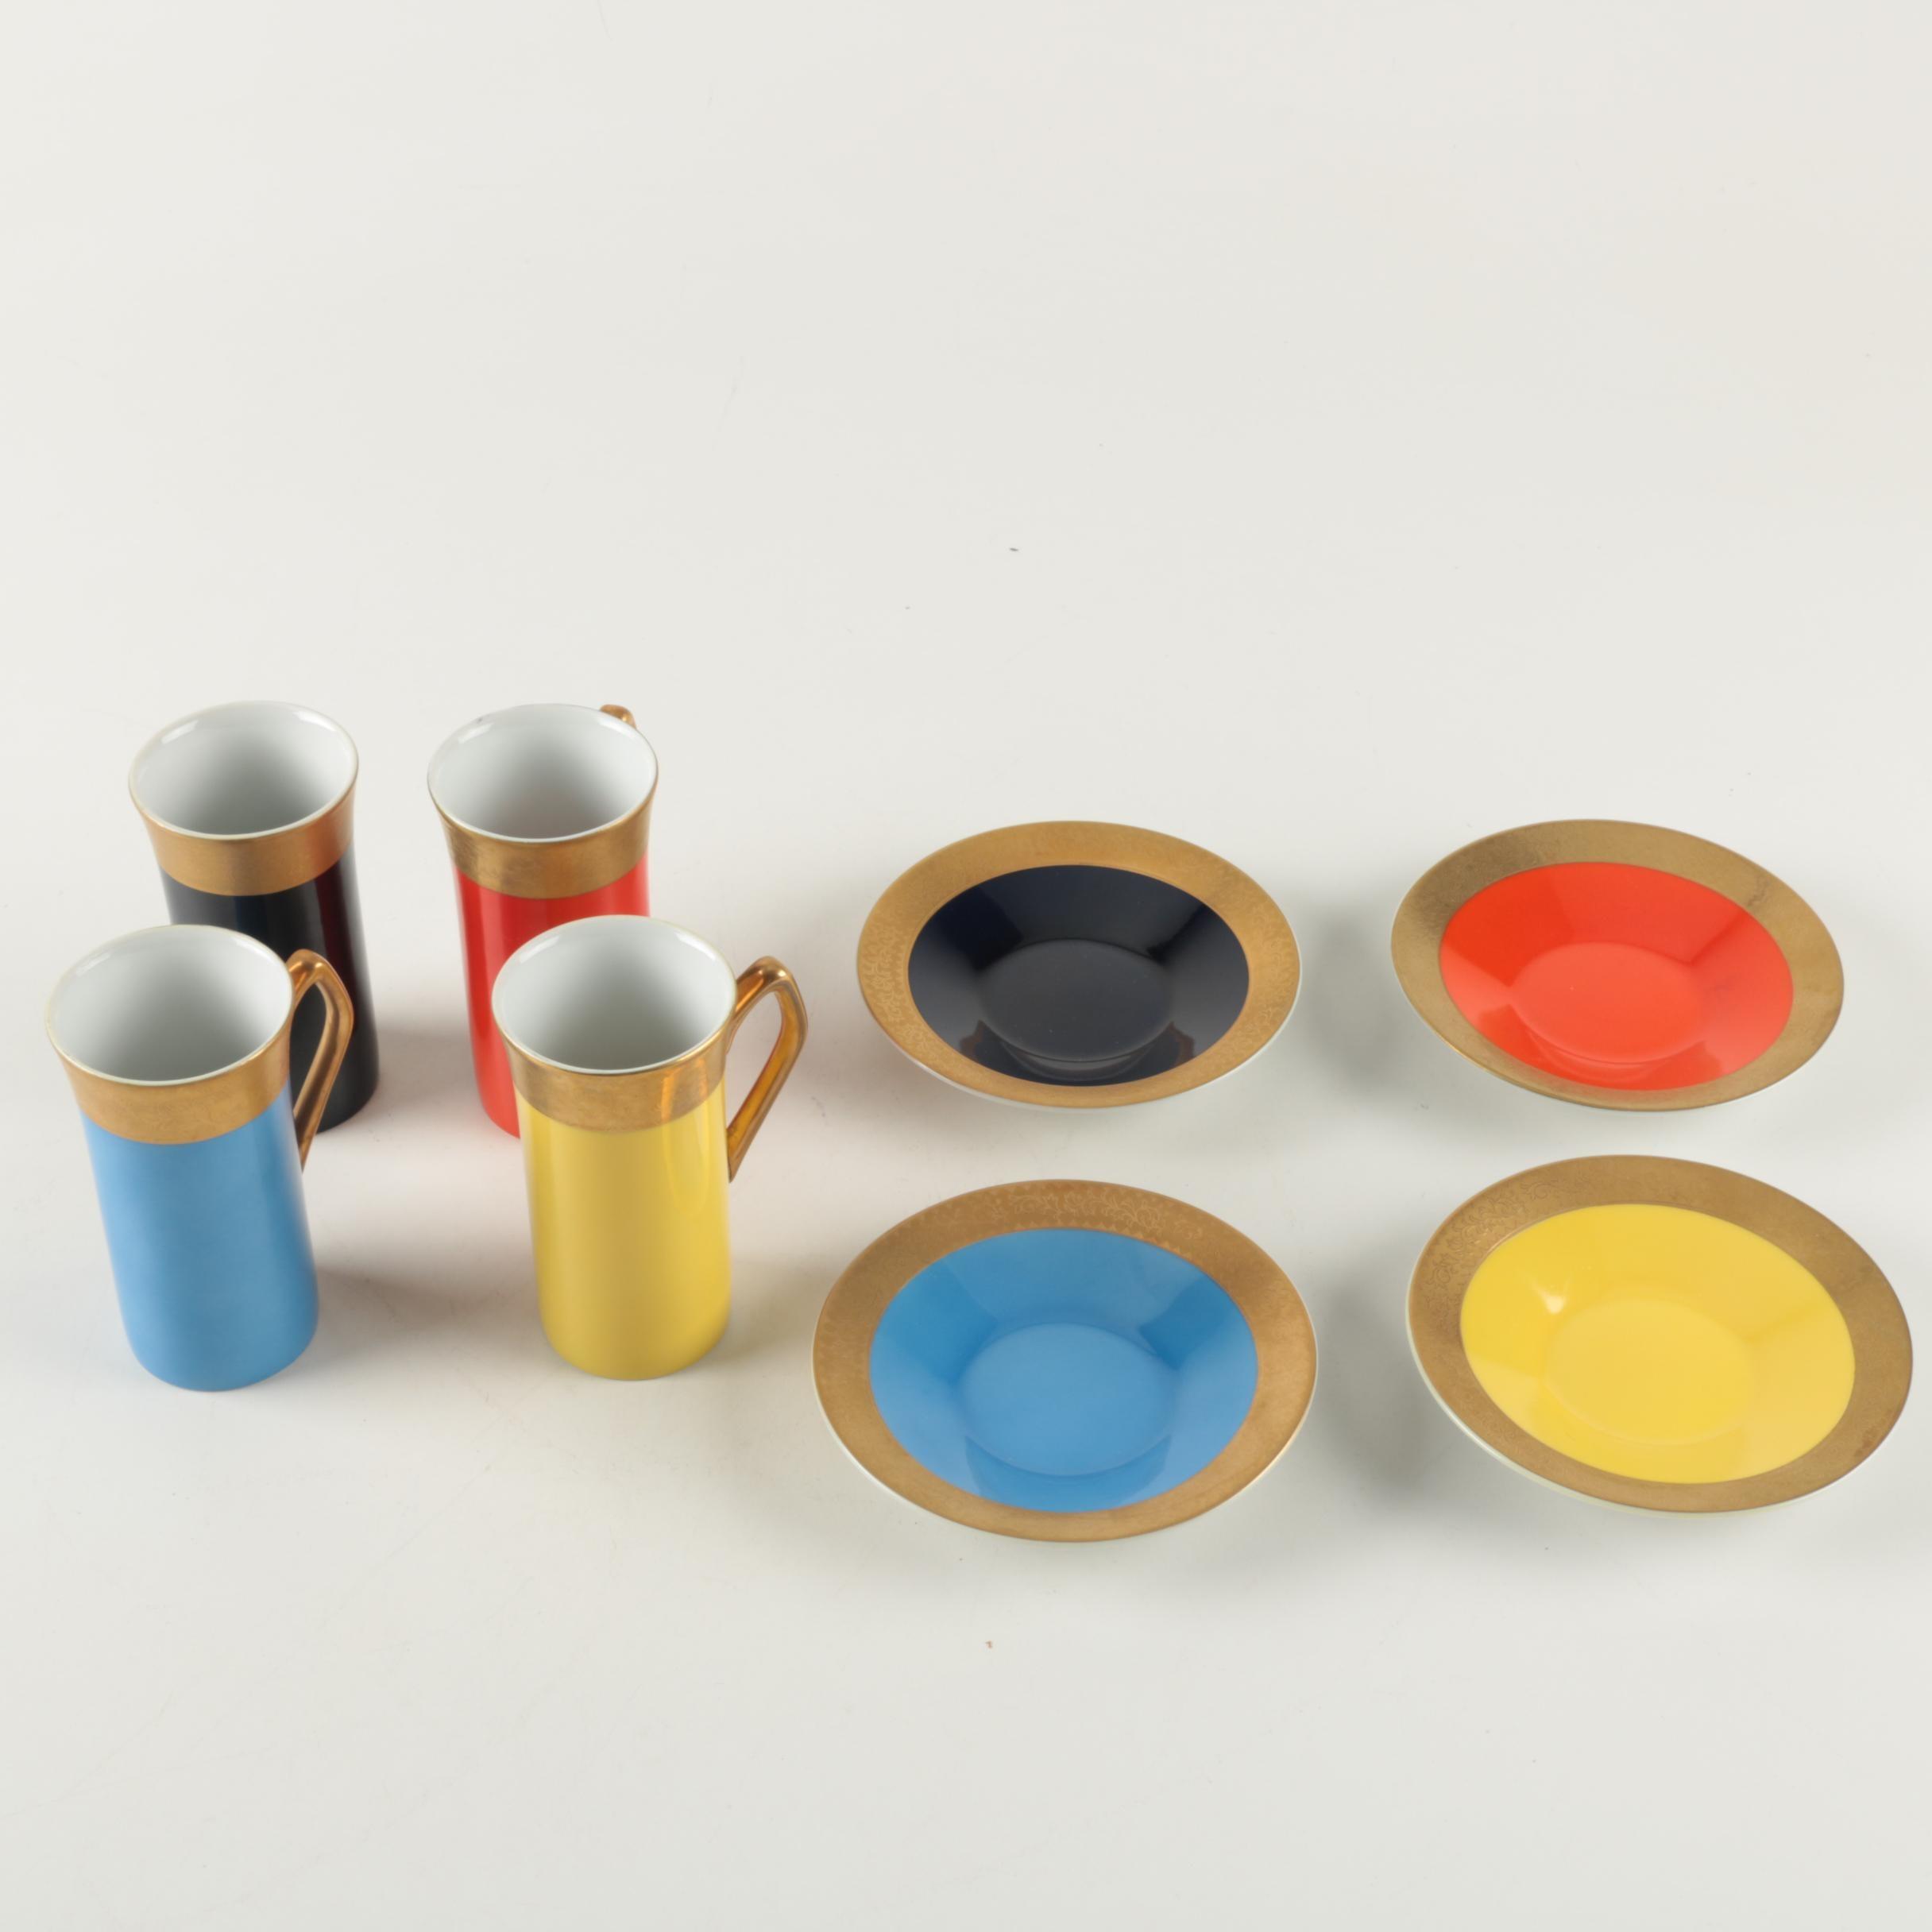 Fine China Japan Porcelain Mugs and Saucers